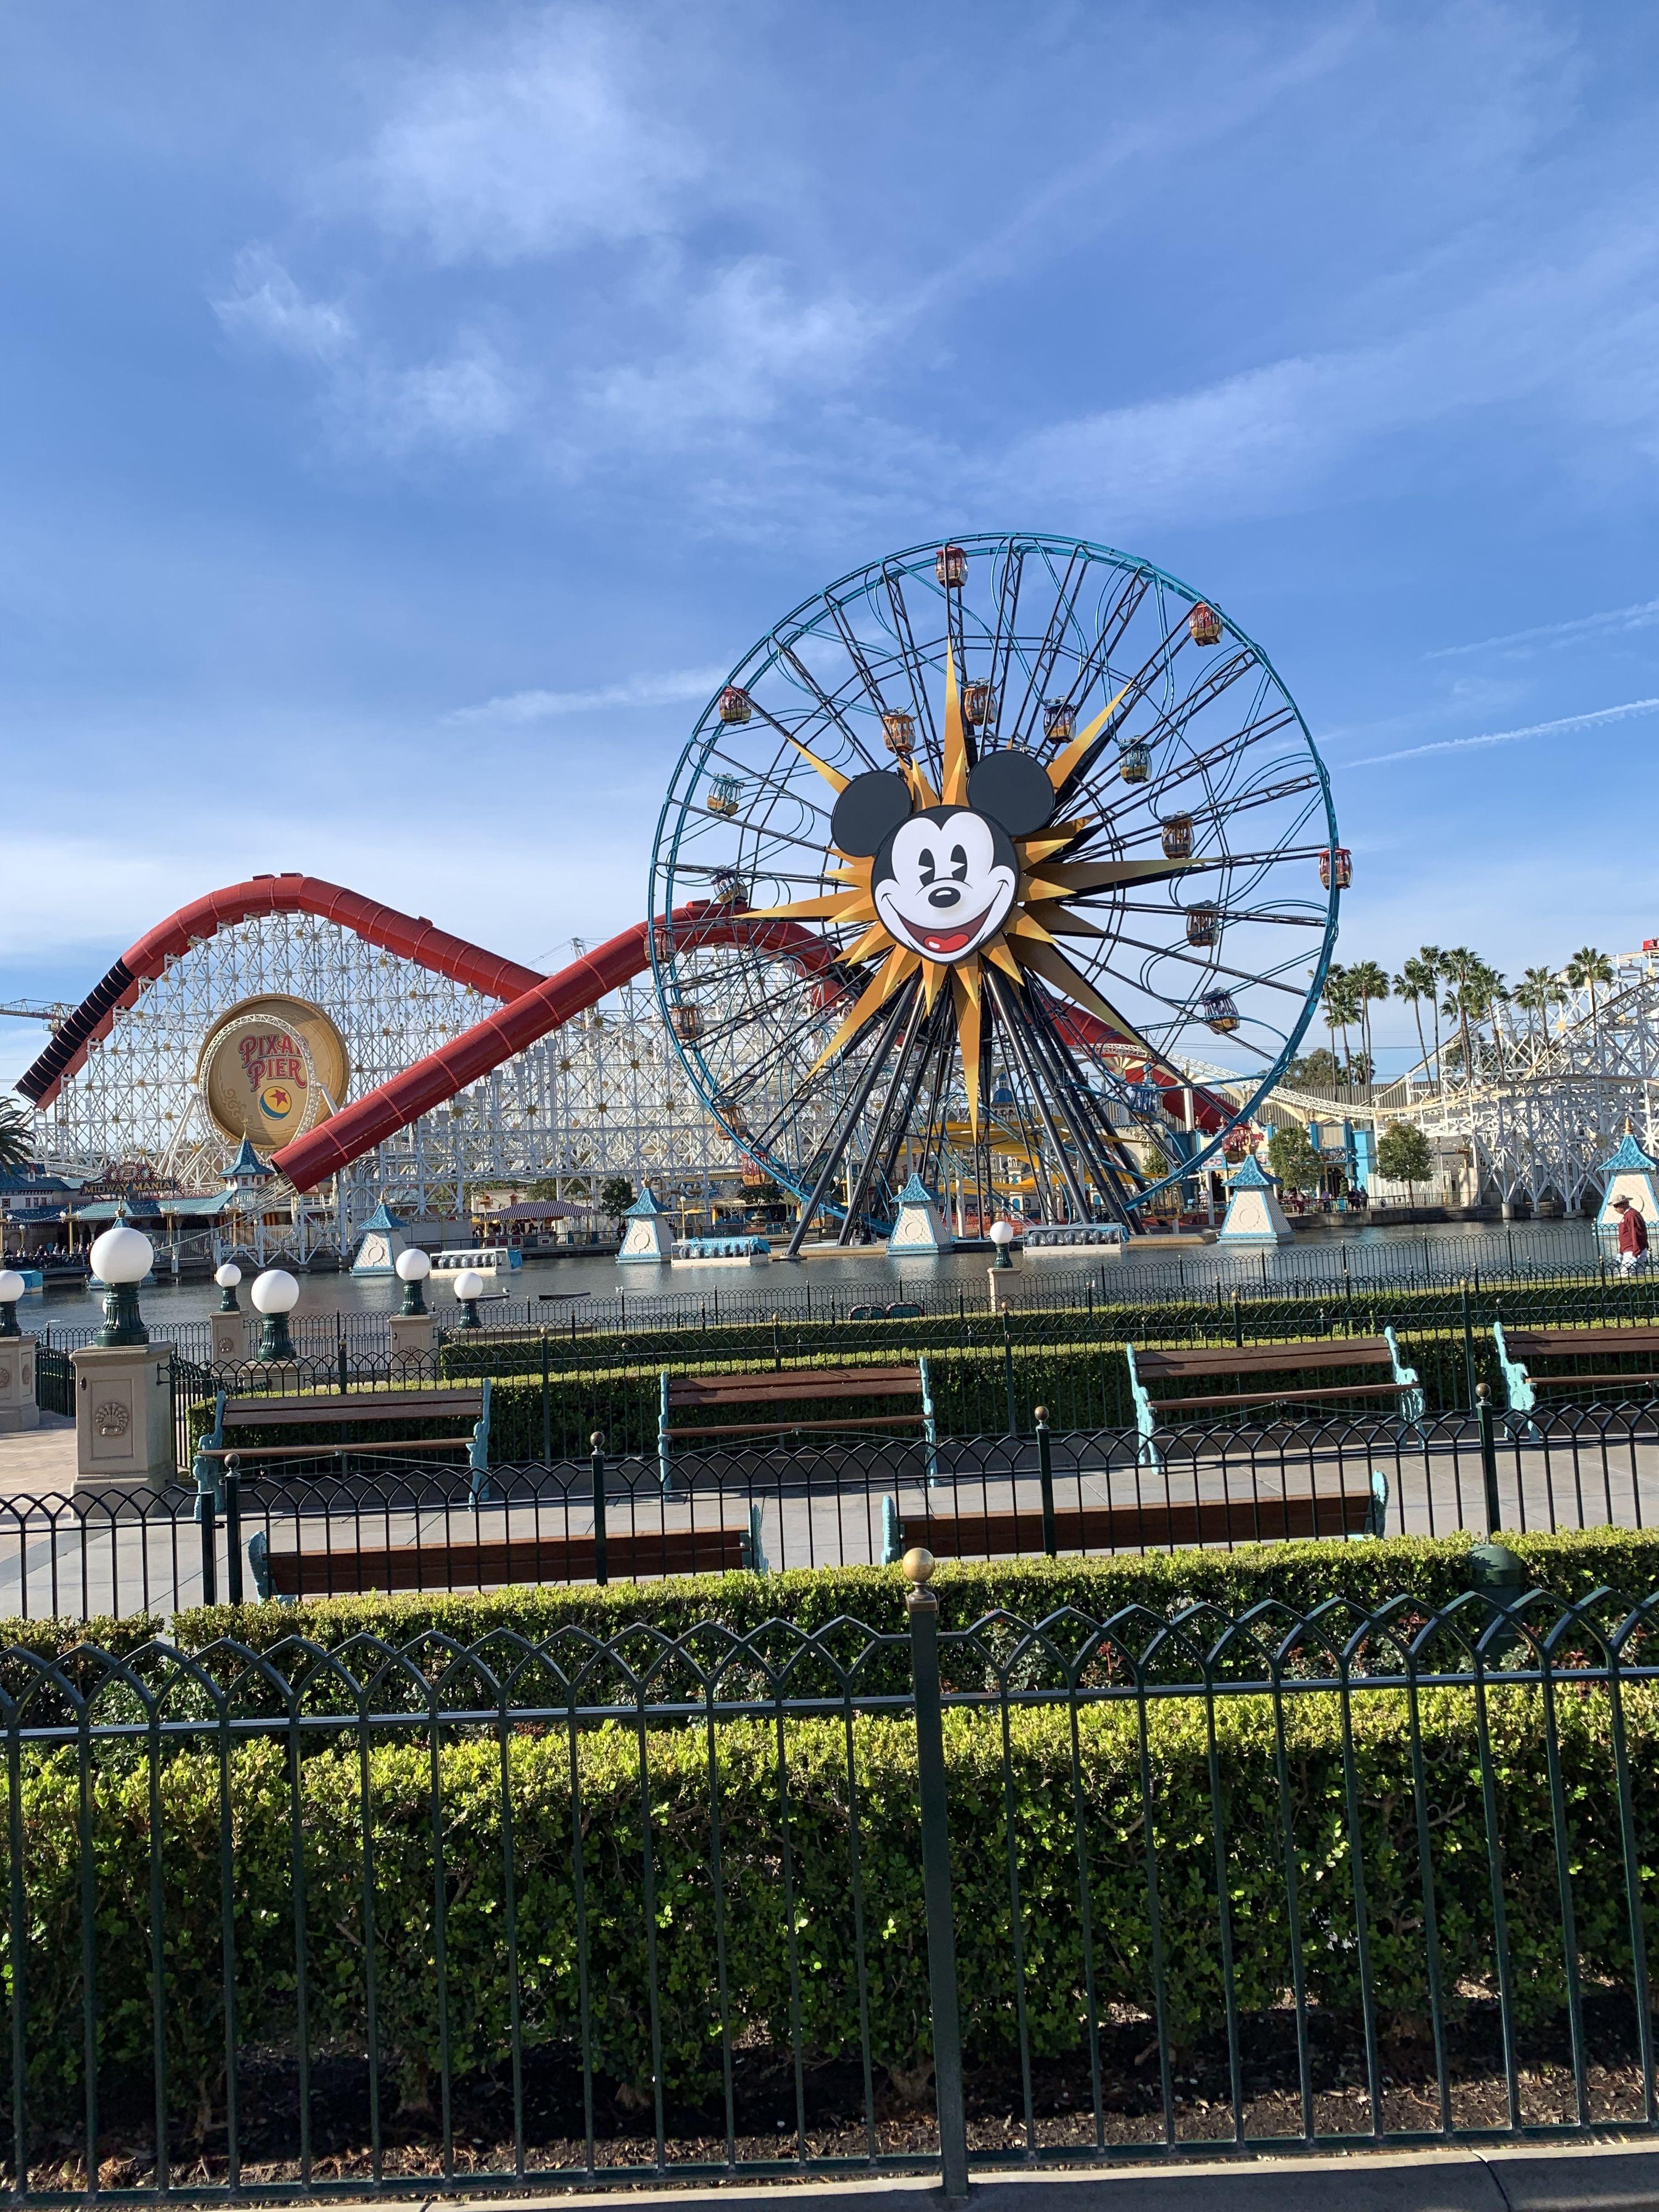 Ferris Wheel California Adventure California Adventure Disney California Adventure Disney California Fence ferris wheel 4k hd photography